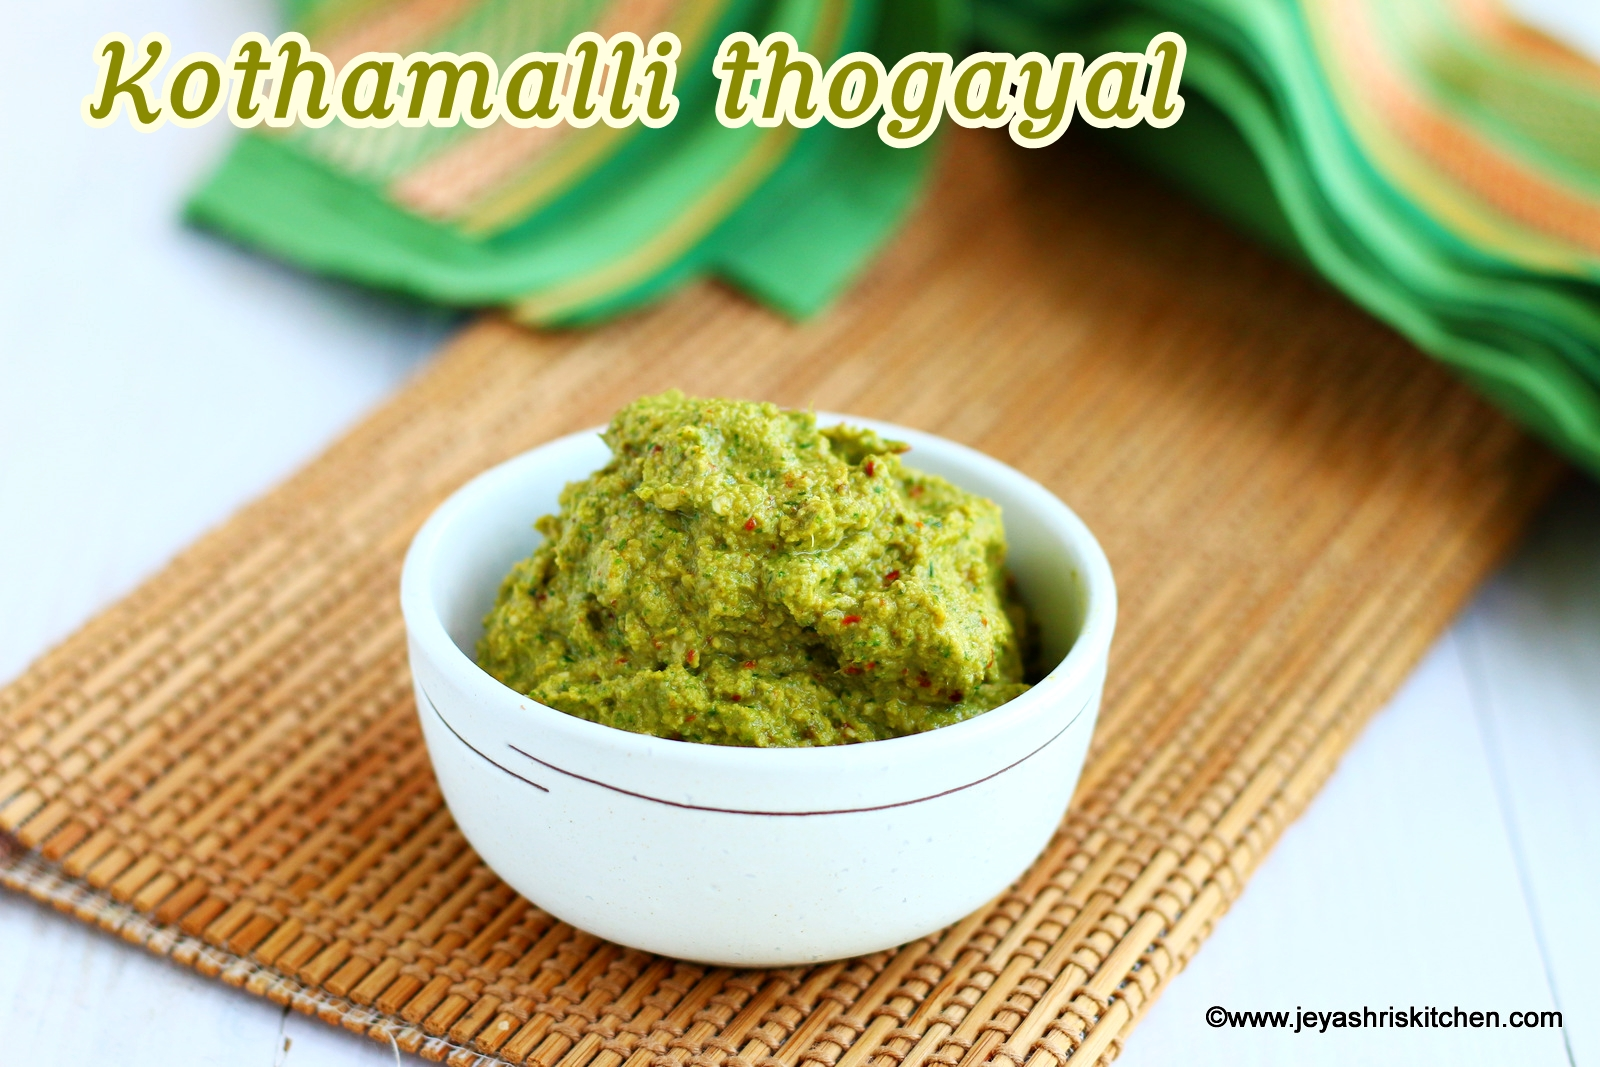 kothamalli thogayal recipe coriander thogayal - Jeyashris Kitchen